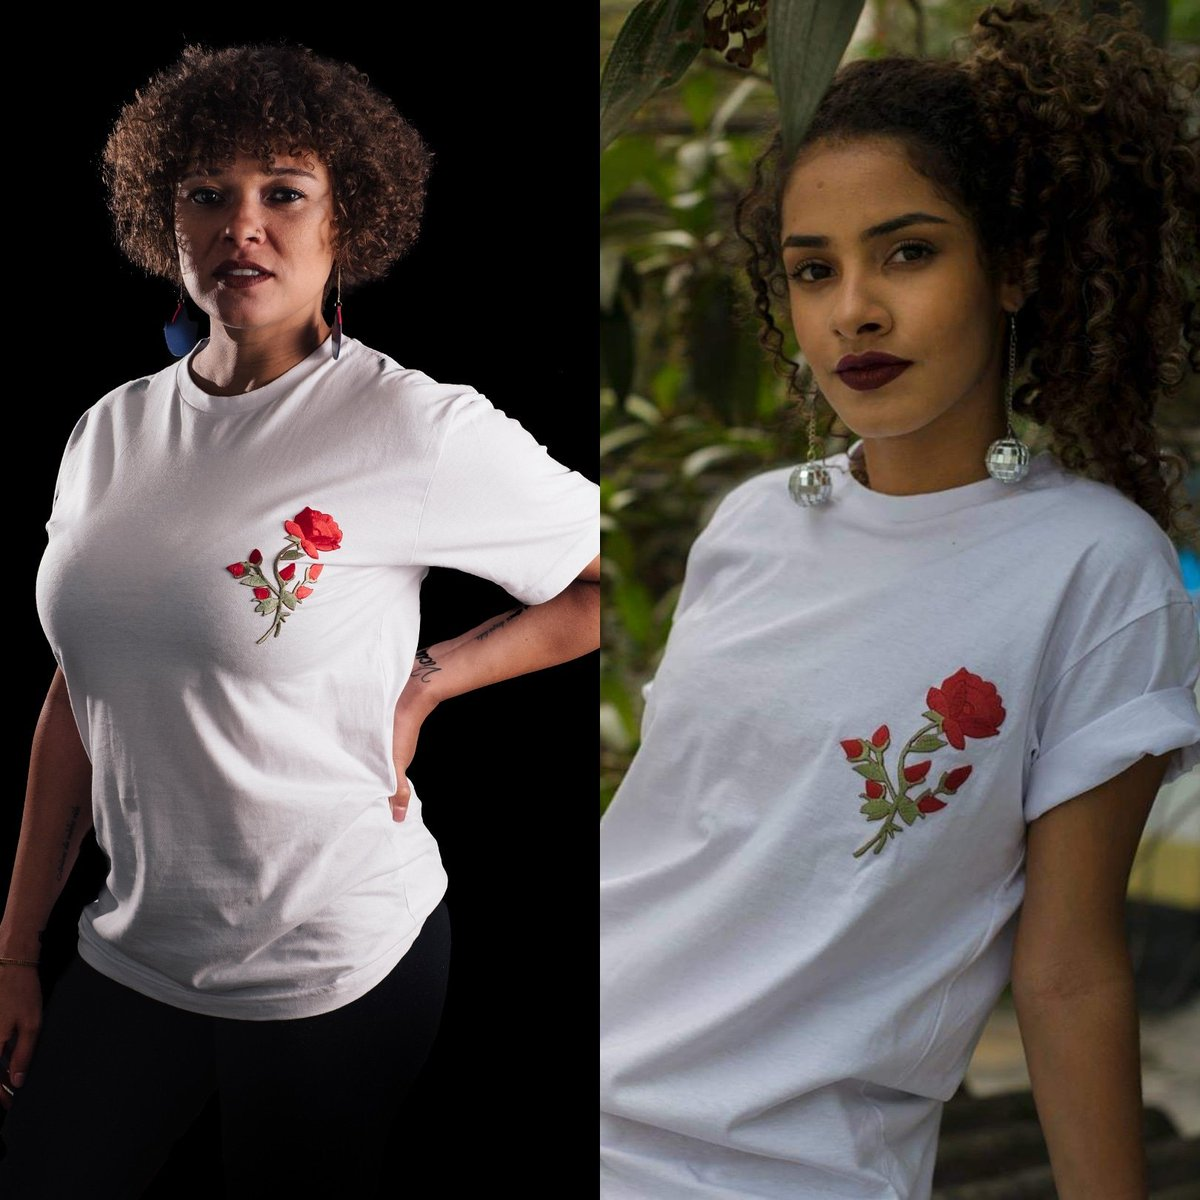 eb8b2c01c  moda  coletivo  collab  design  fashion  modaderua  fashionbrasil   streetwear  moda  grafite  slowfashion  fashionistas  estilo  estilos   camisetas  street ...